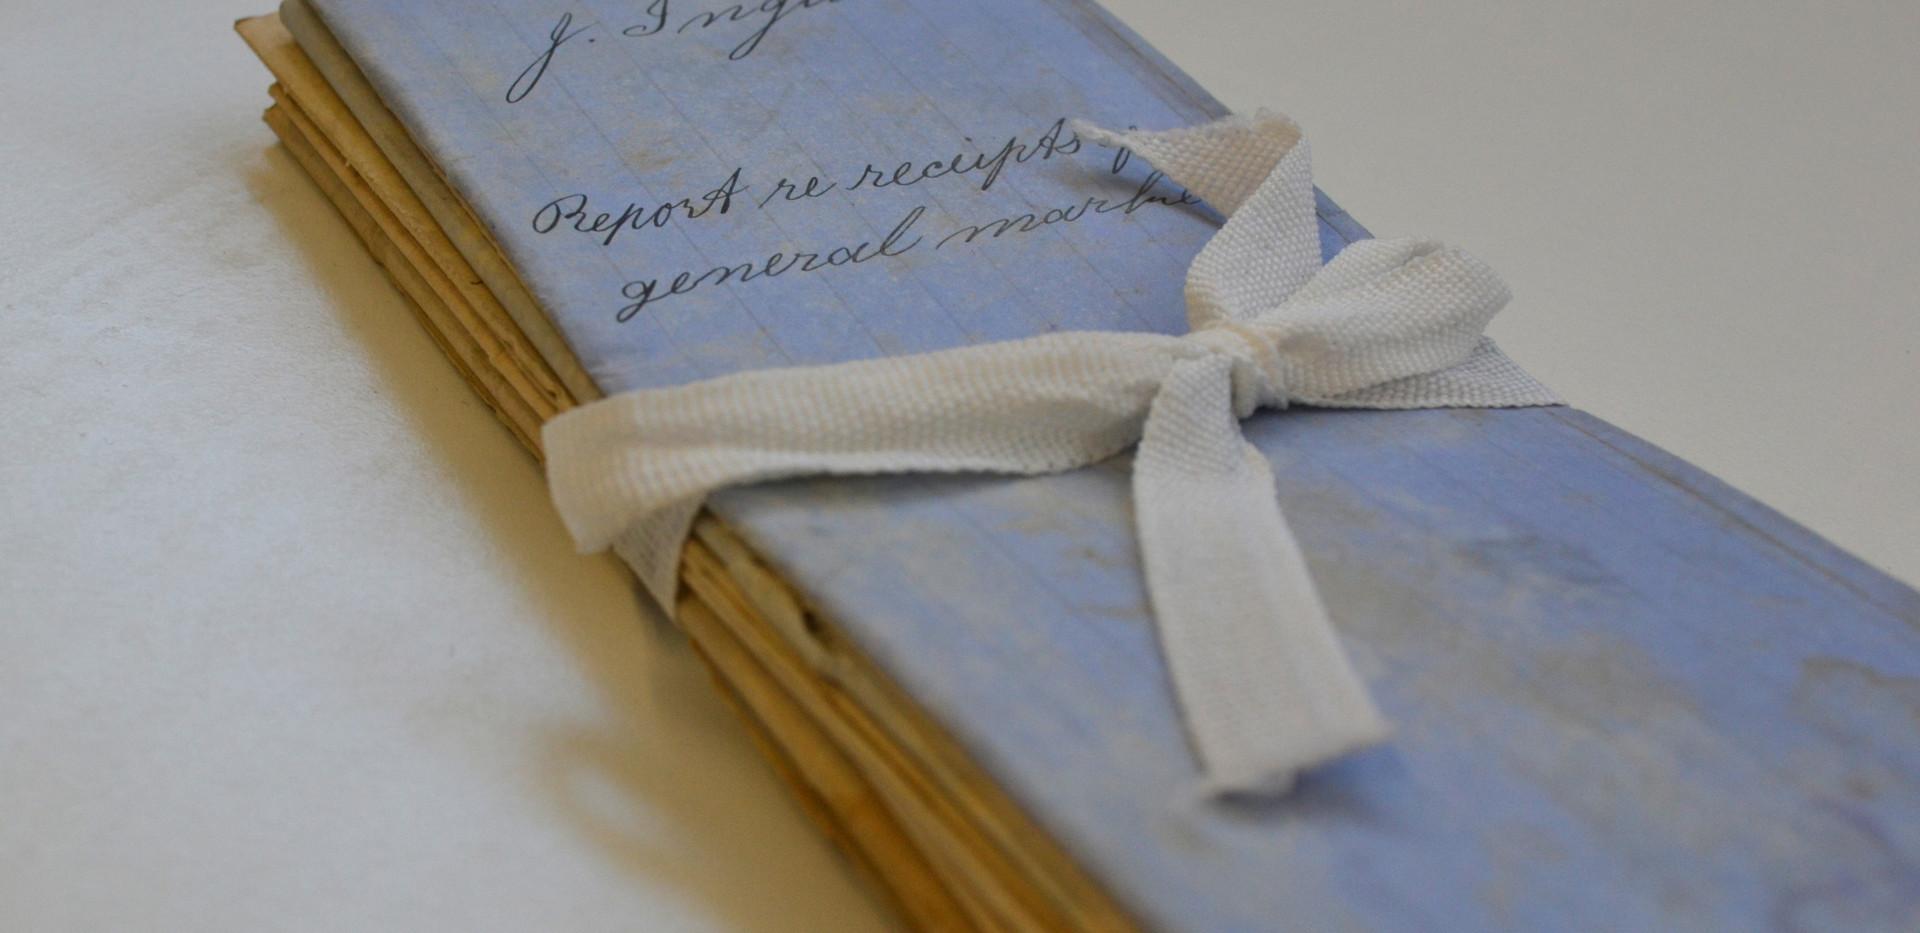 Bendigo Correspondence